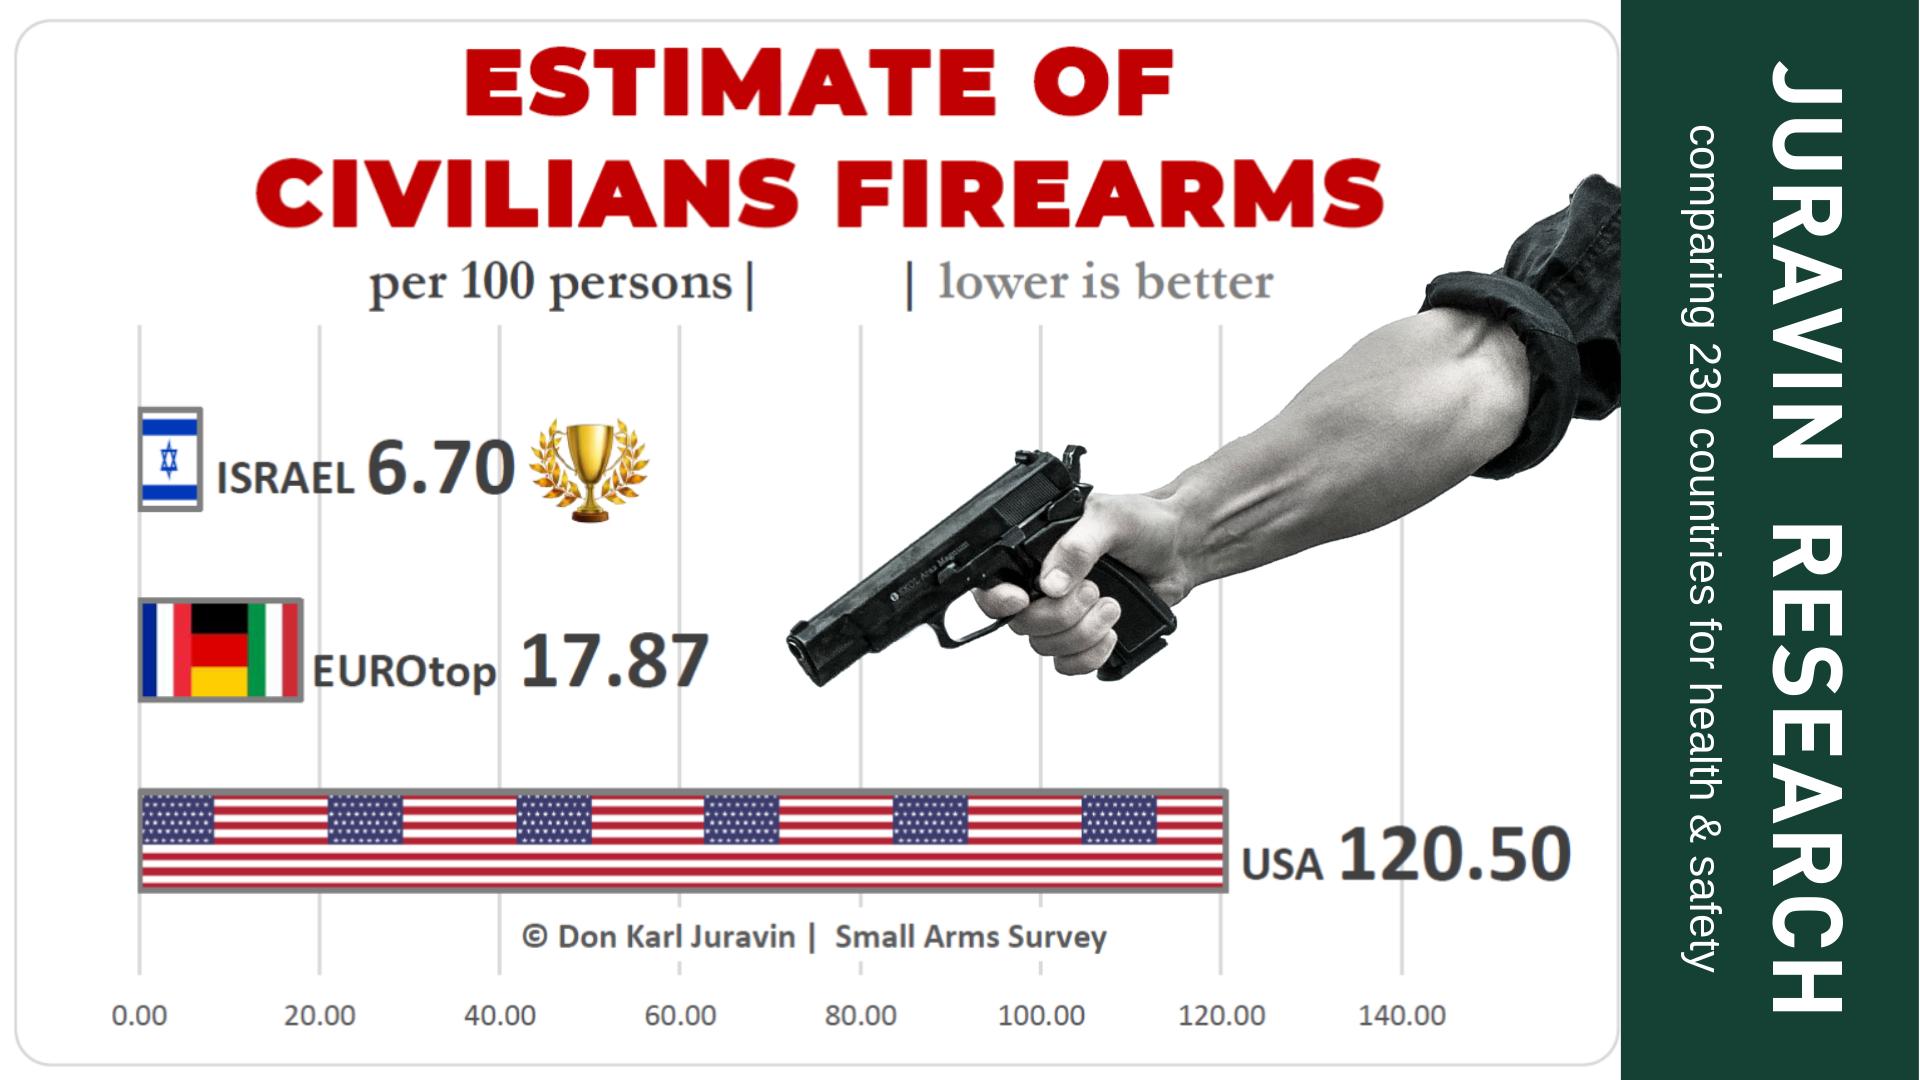 Civilian gun pocession chart comparison - JURAVIN RESEARCH by Don Karl Juravin